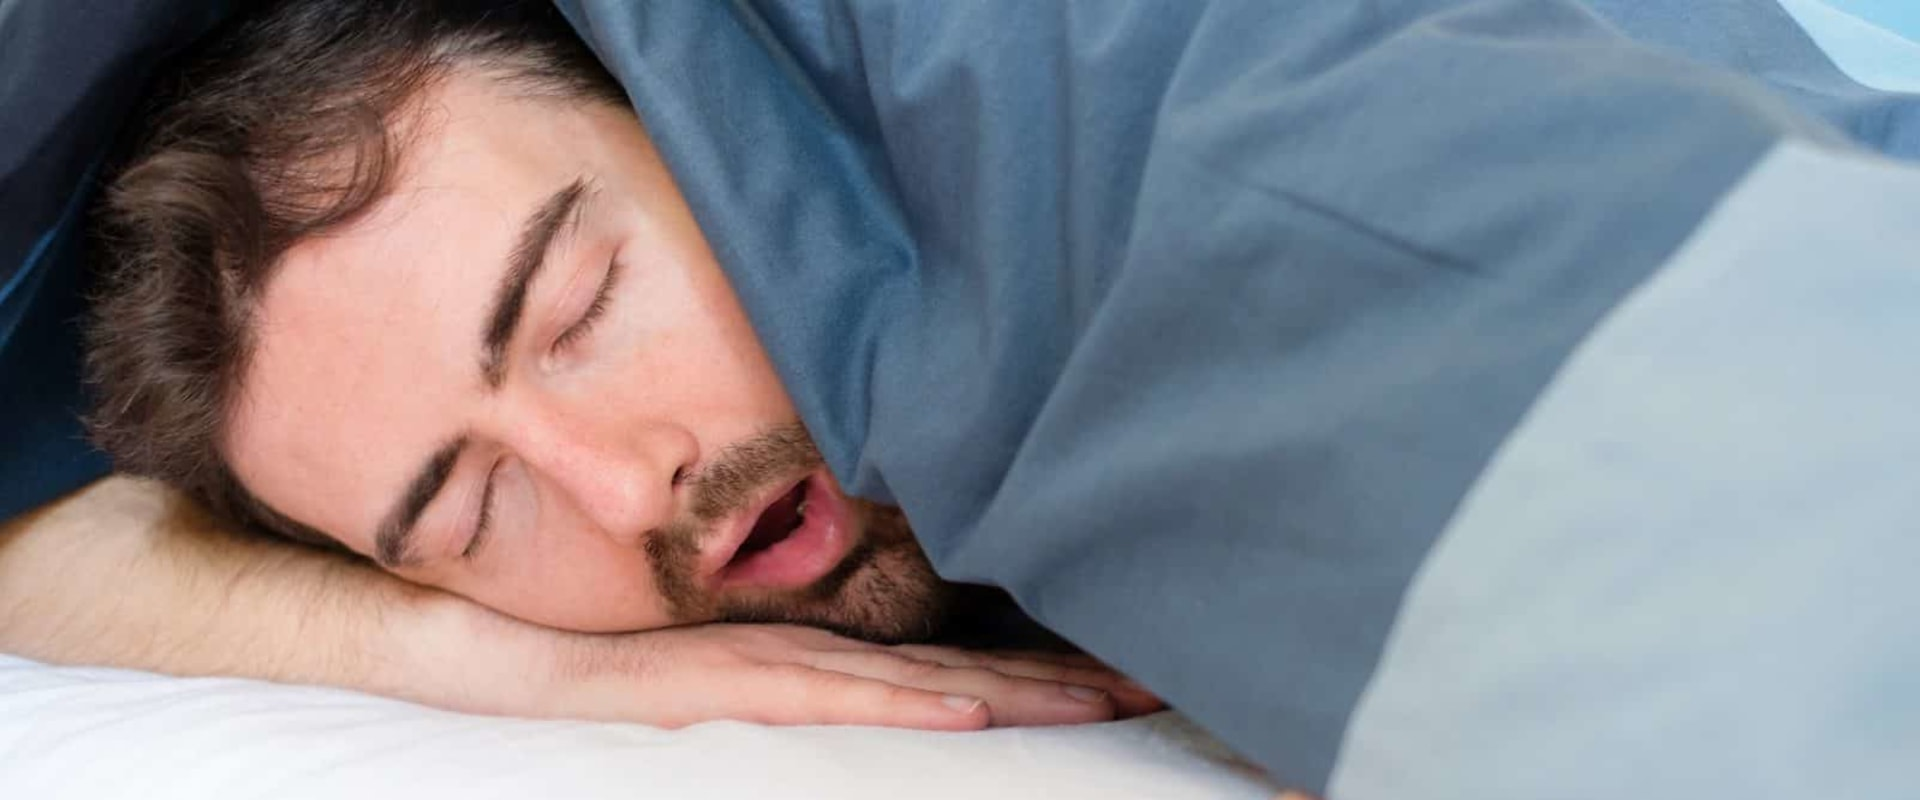 will sleep apnoea kill you?